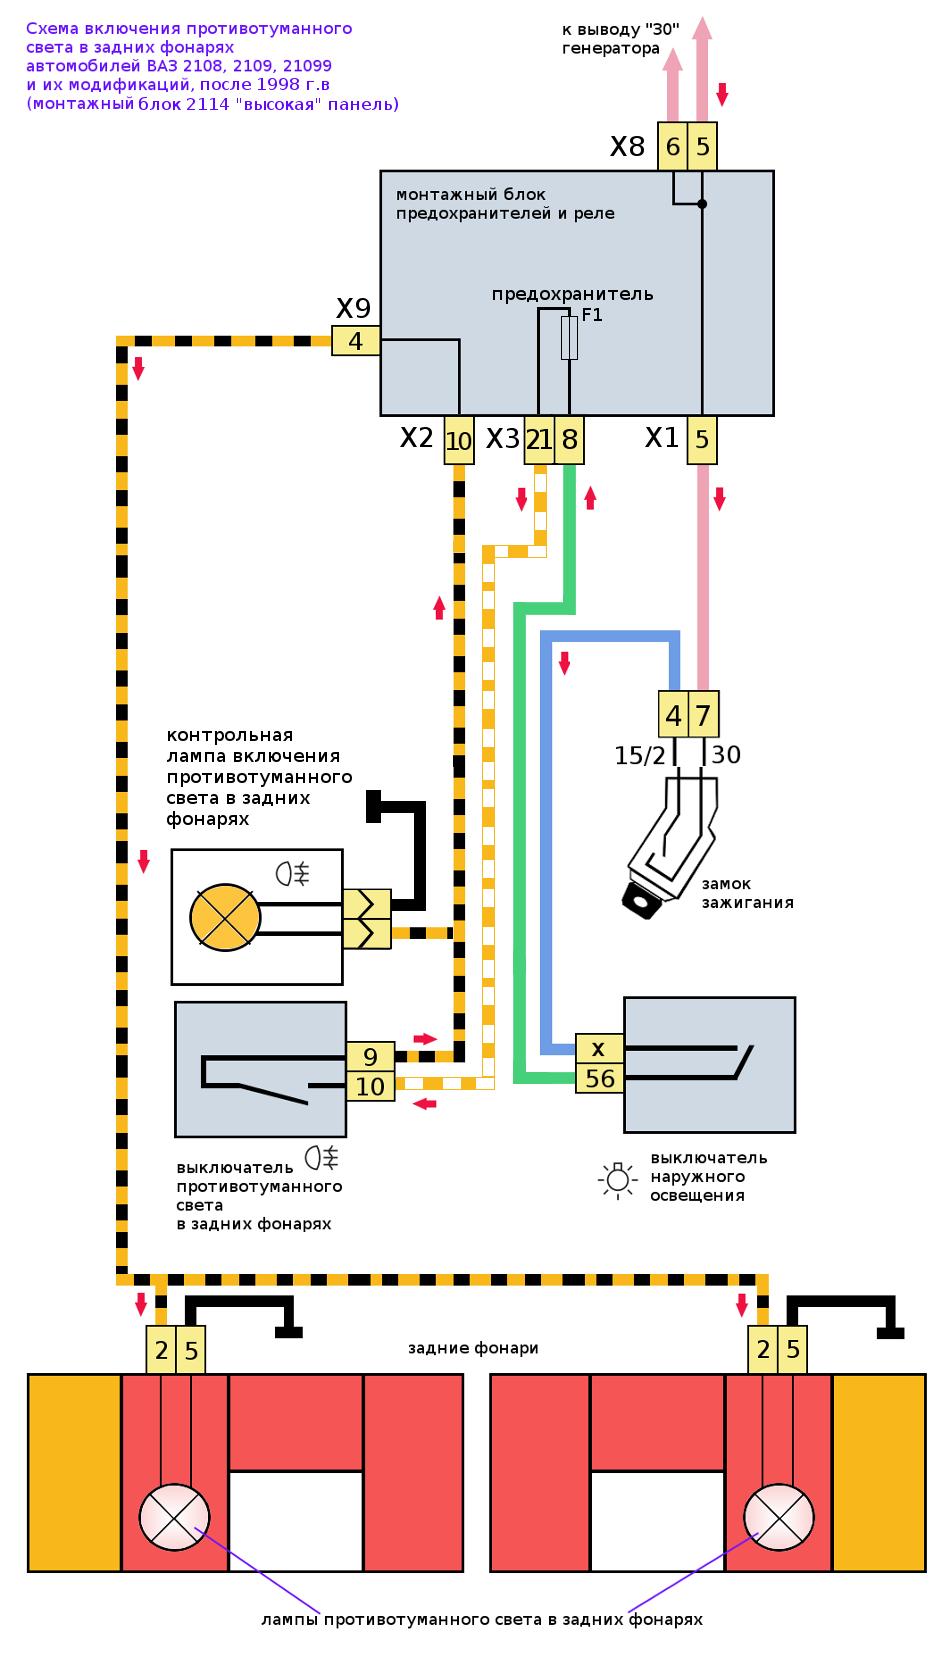 схема противотуманного света в задних фонарях 2114